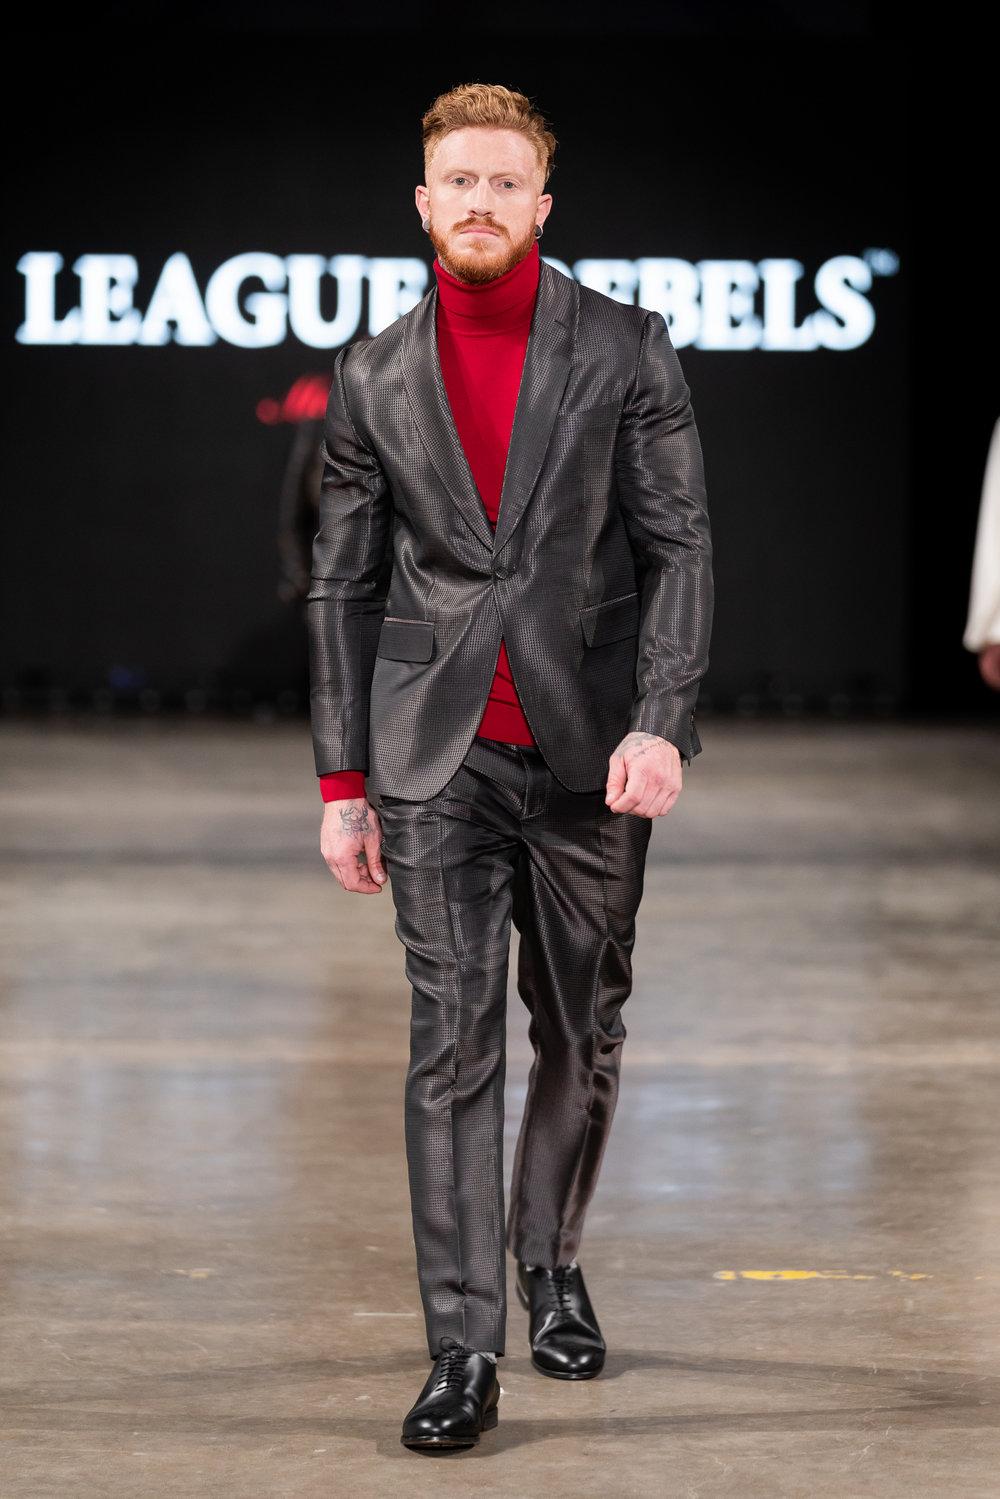 Austin Fashion Week Day 2 League of Rebels - MTM by Linn Images-41.jpg